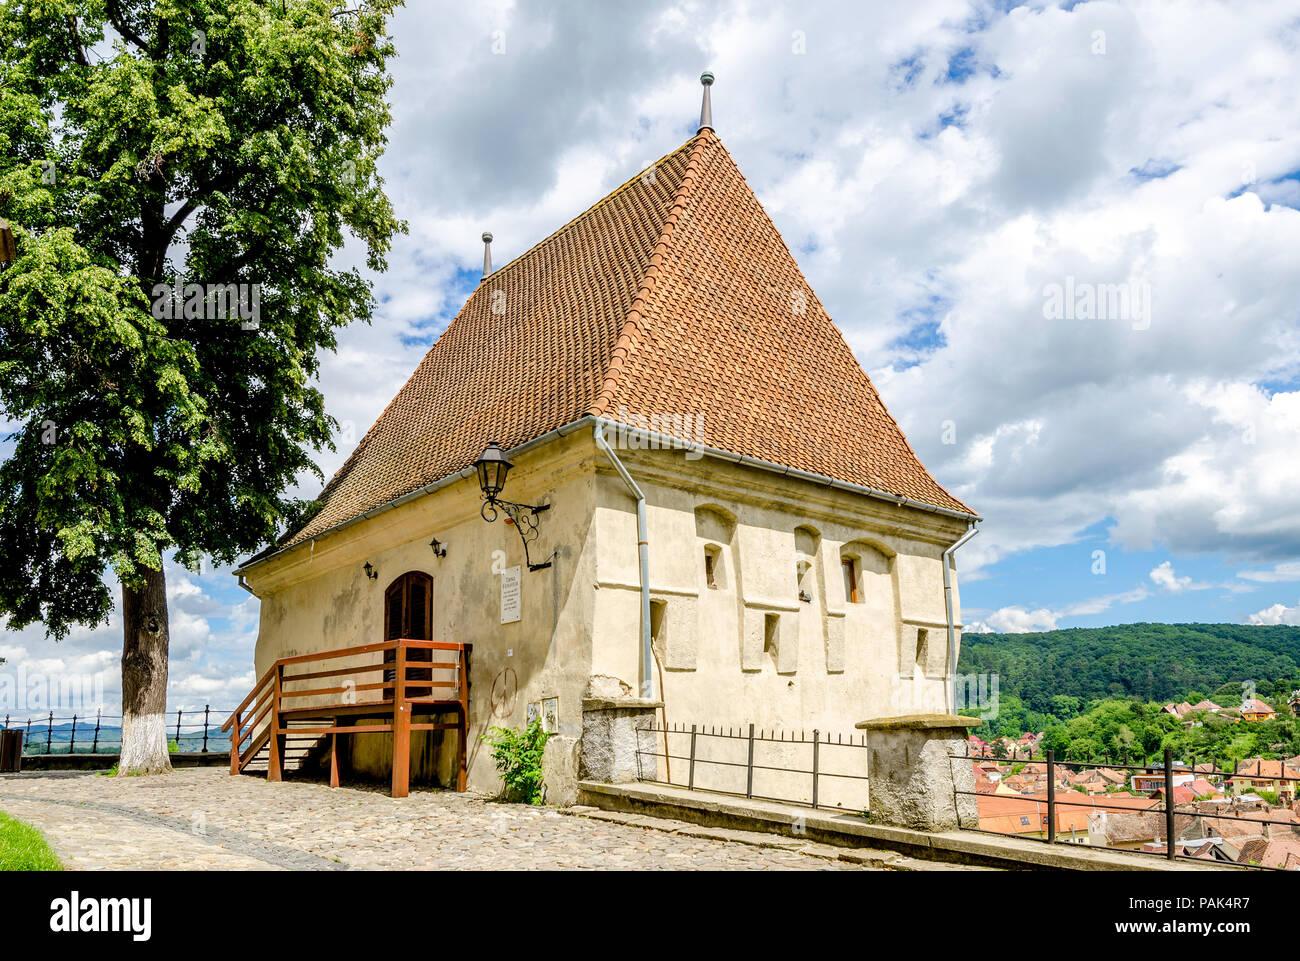 Blacksmith's Tower in Sighisoara World Herritage site in Transylvania region of Romania - Stock Image